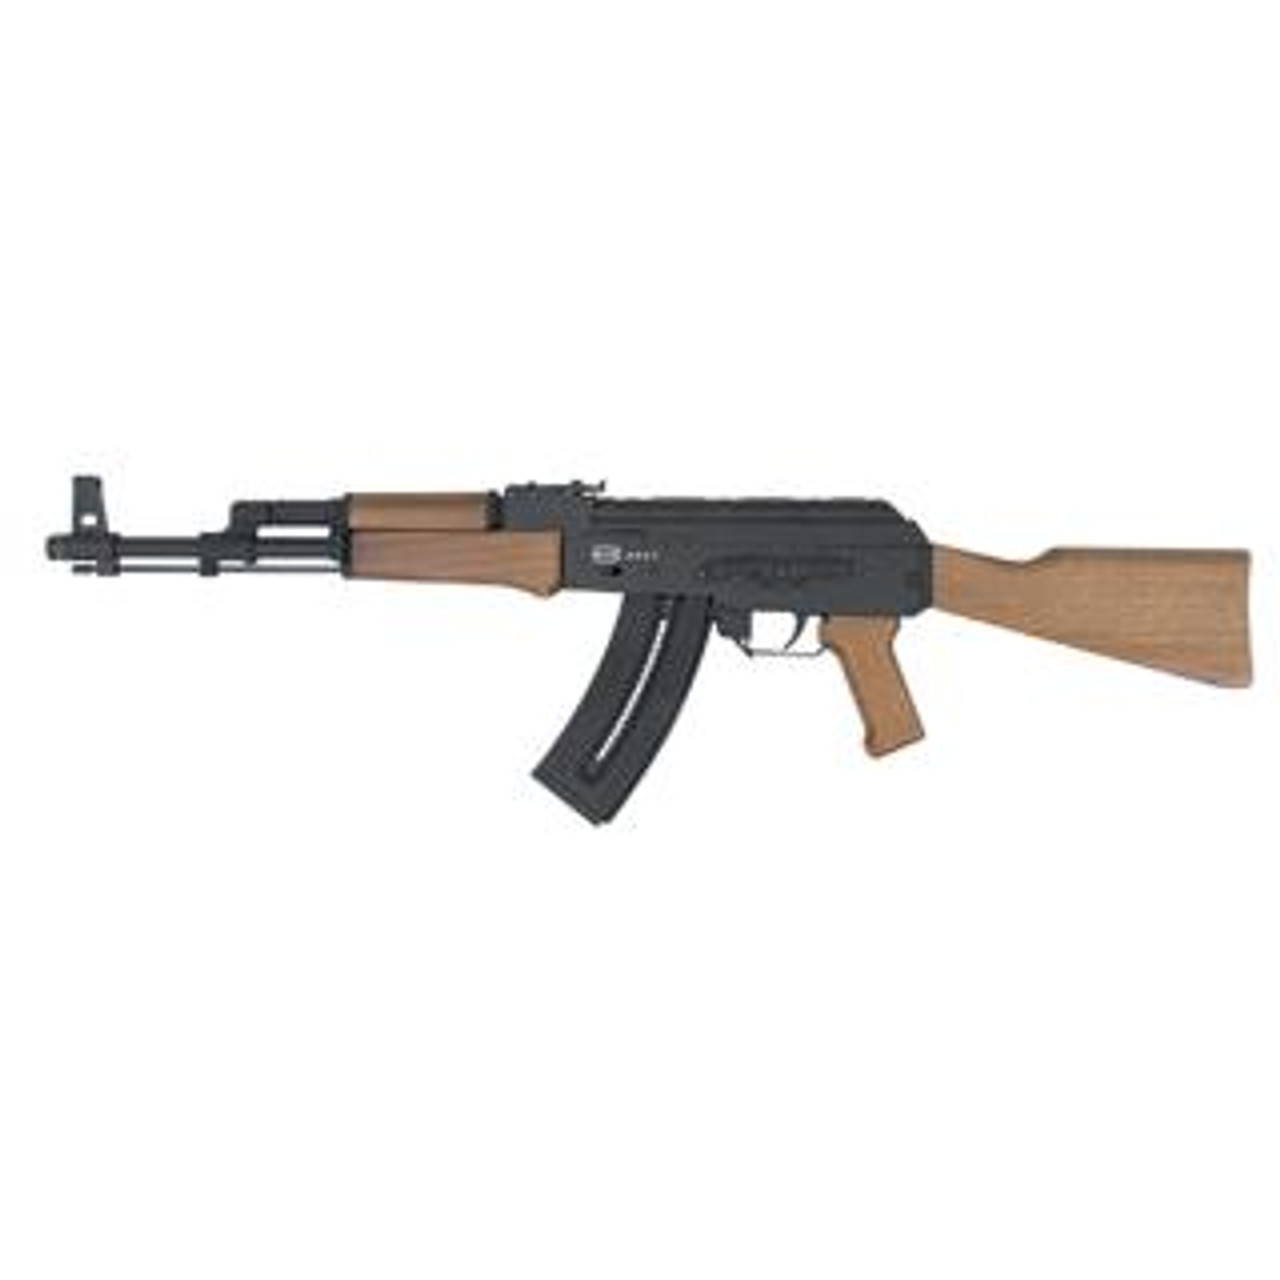 Blue Line Global Mauser AK47 CALIFORNIA LEGAL - .22 LR - Black/Wood